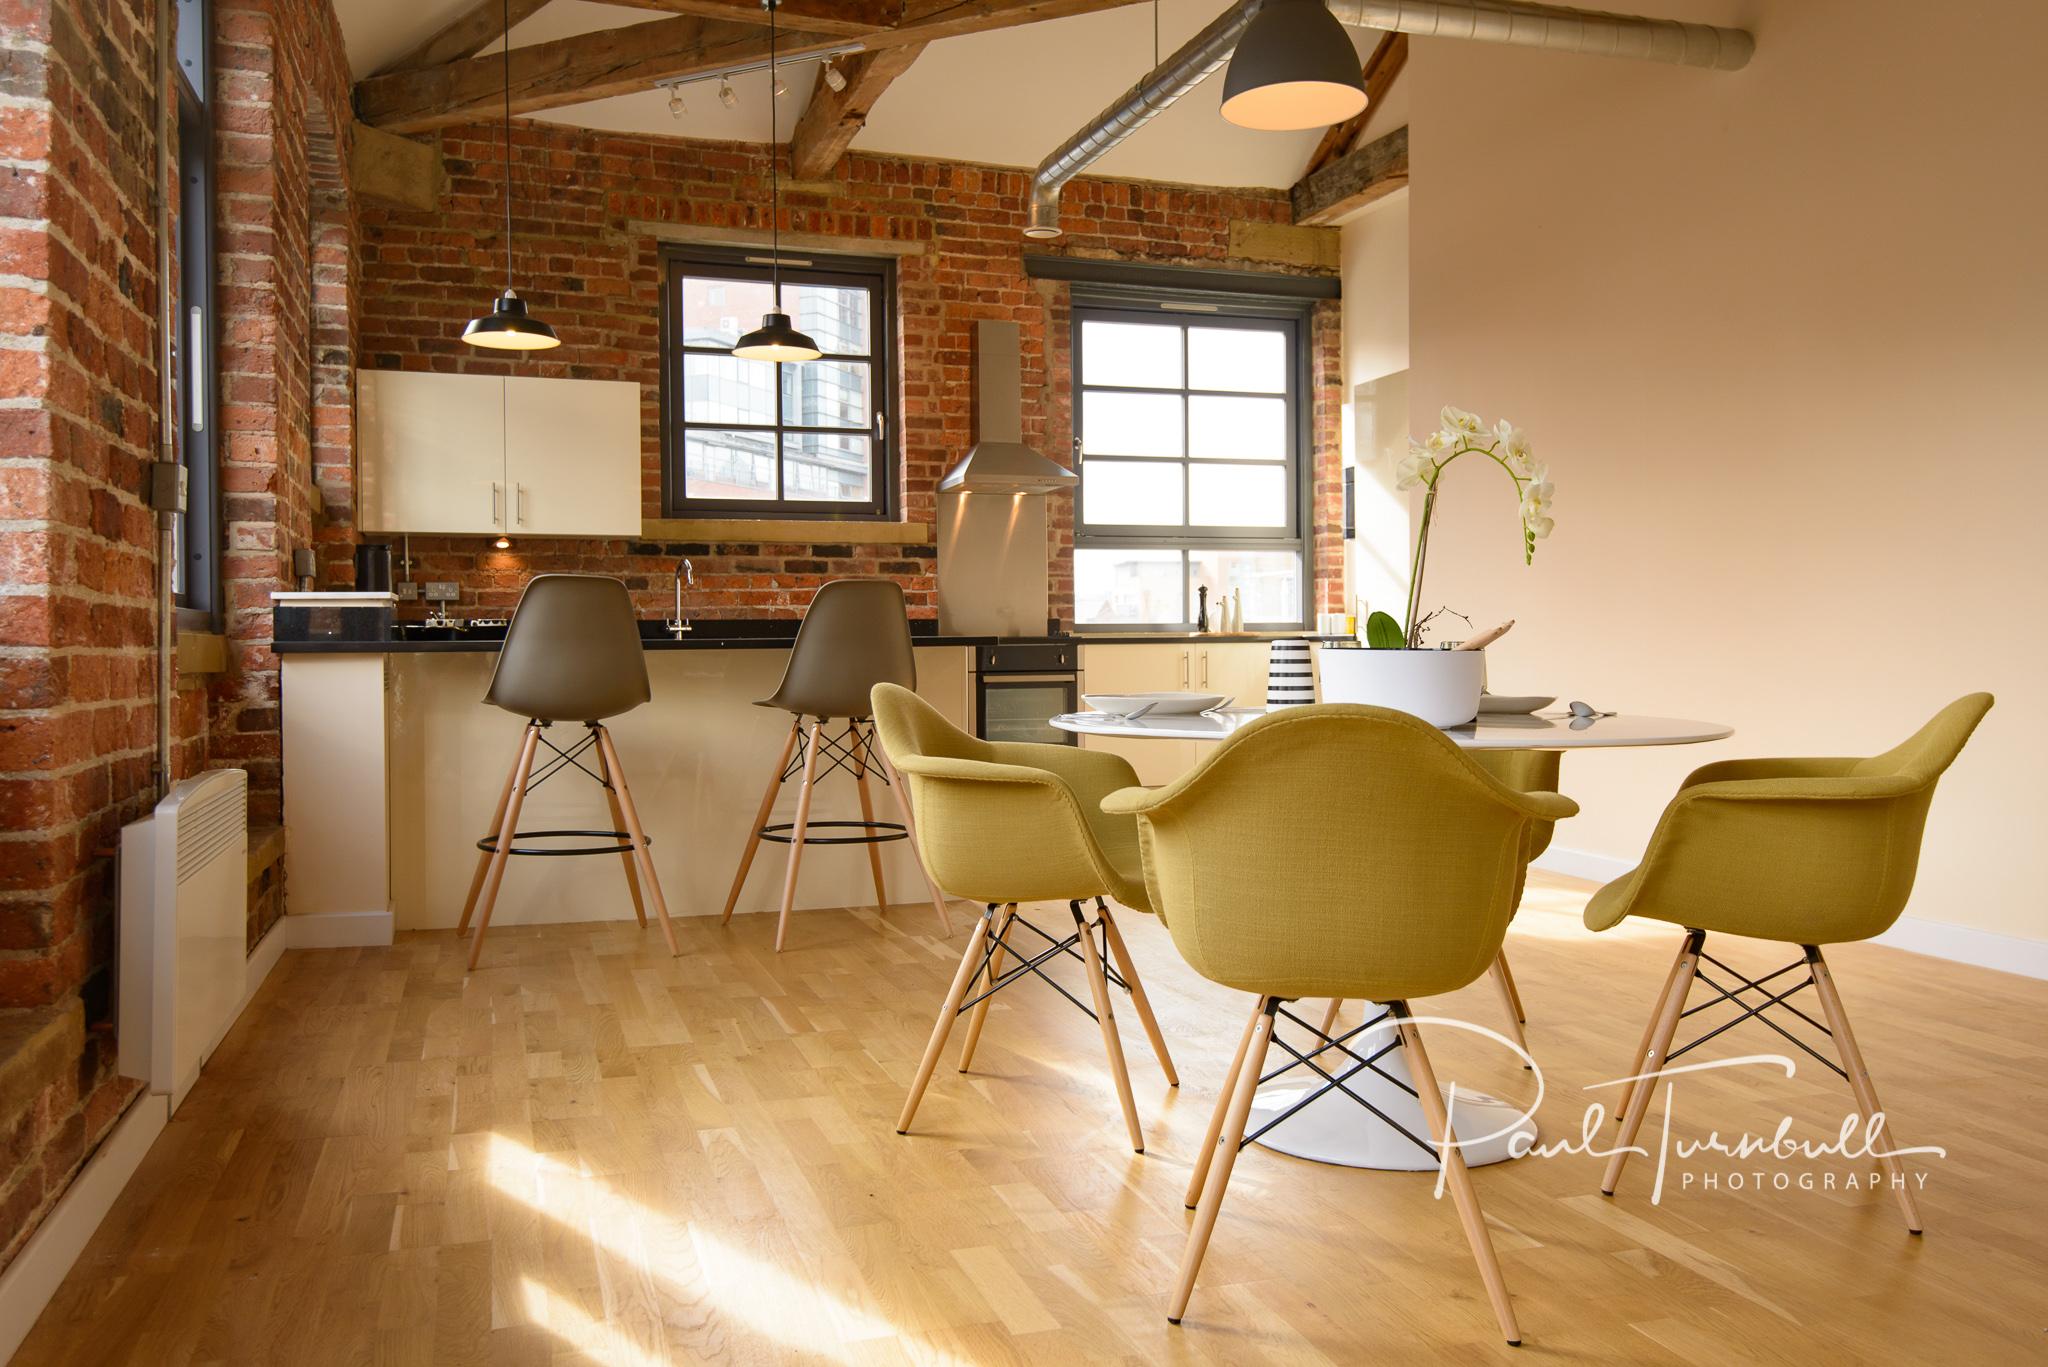 commercial-property-photographer-leeds-yorkshire-blackbrook-developments-017.jpg